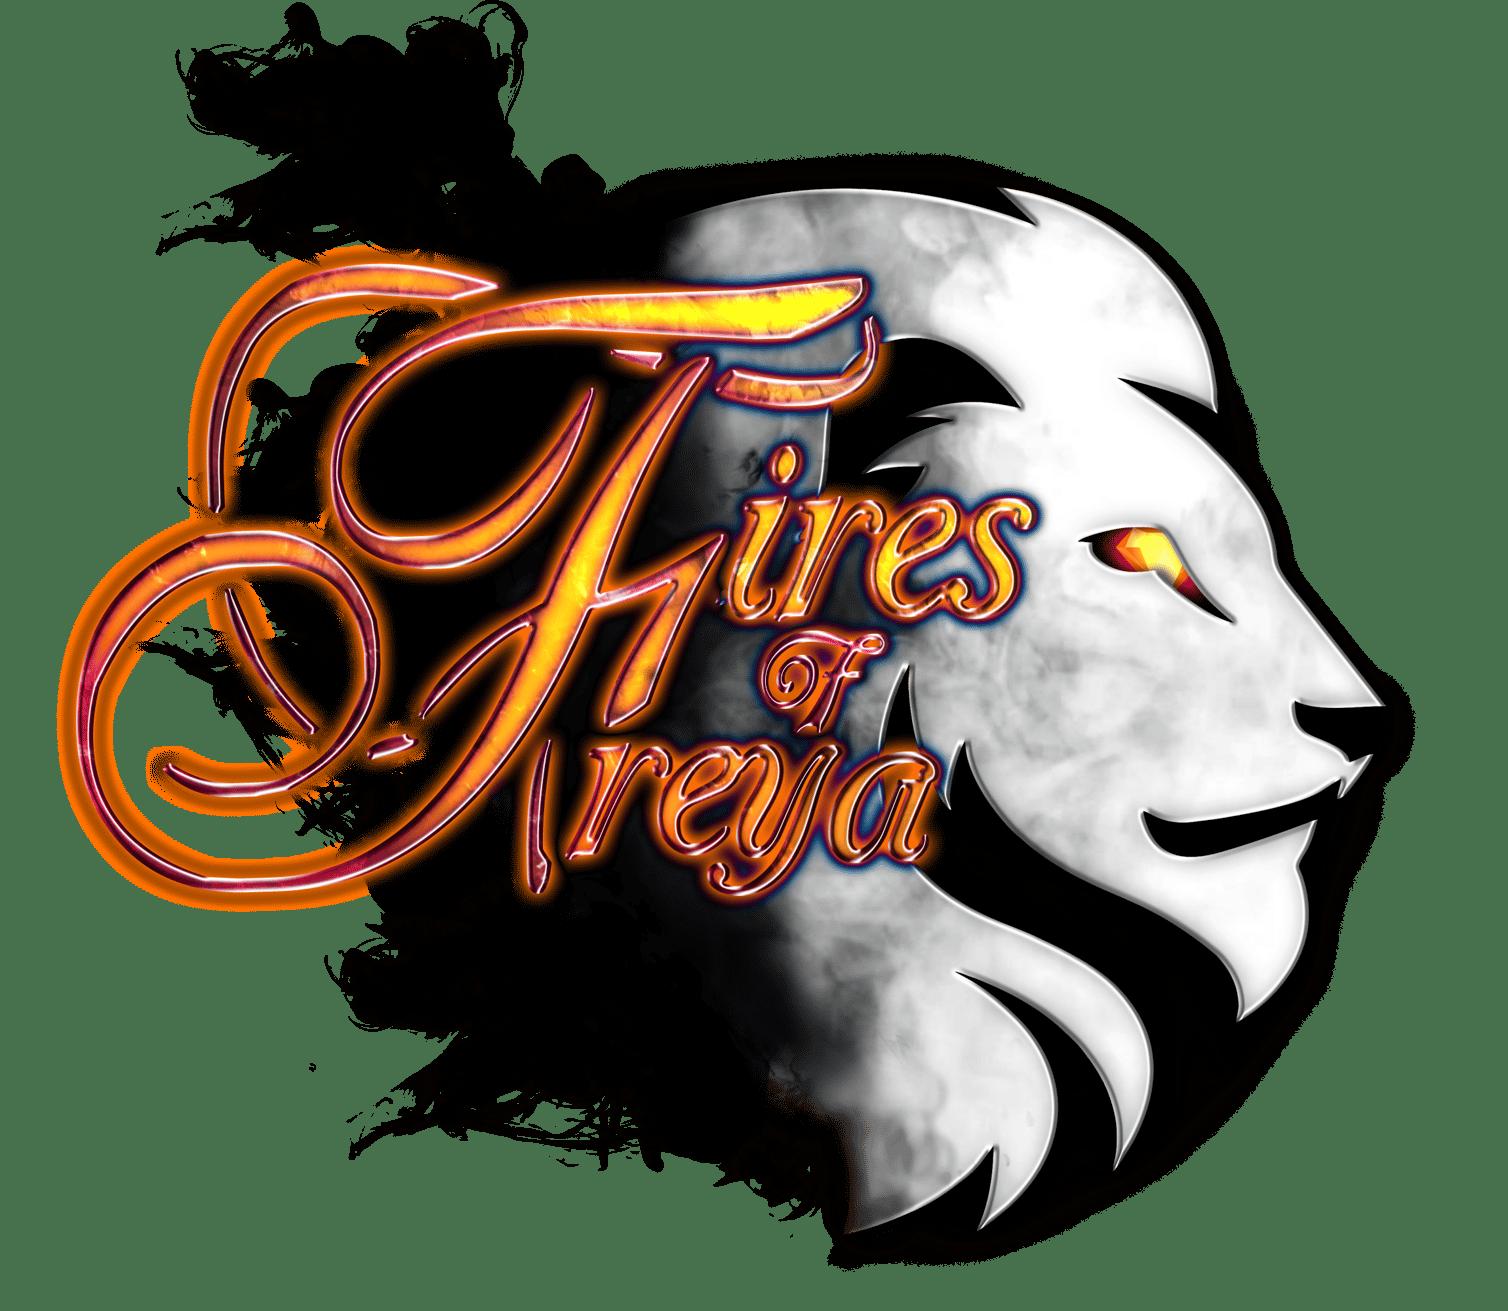 Fires of Freya official